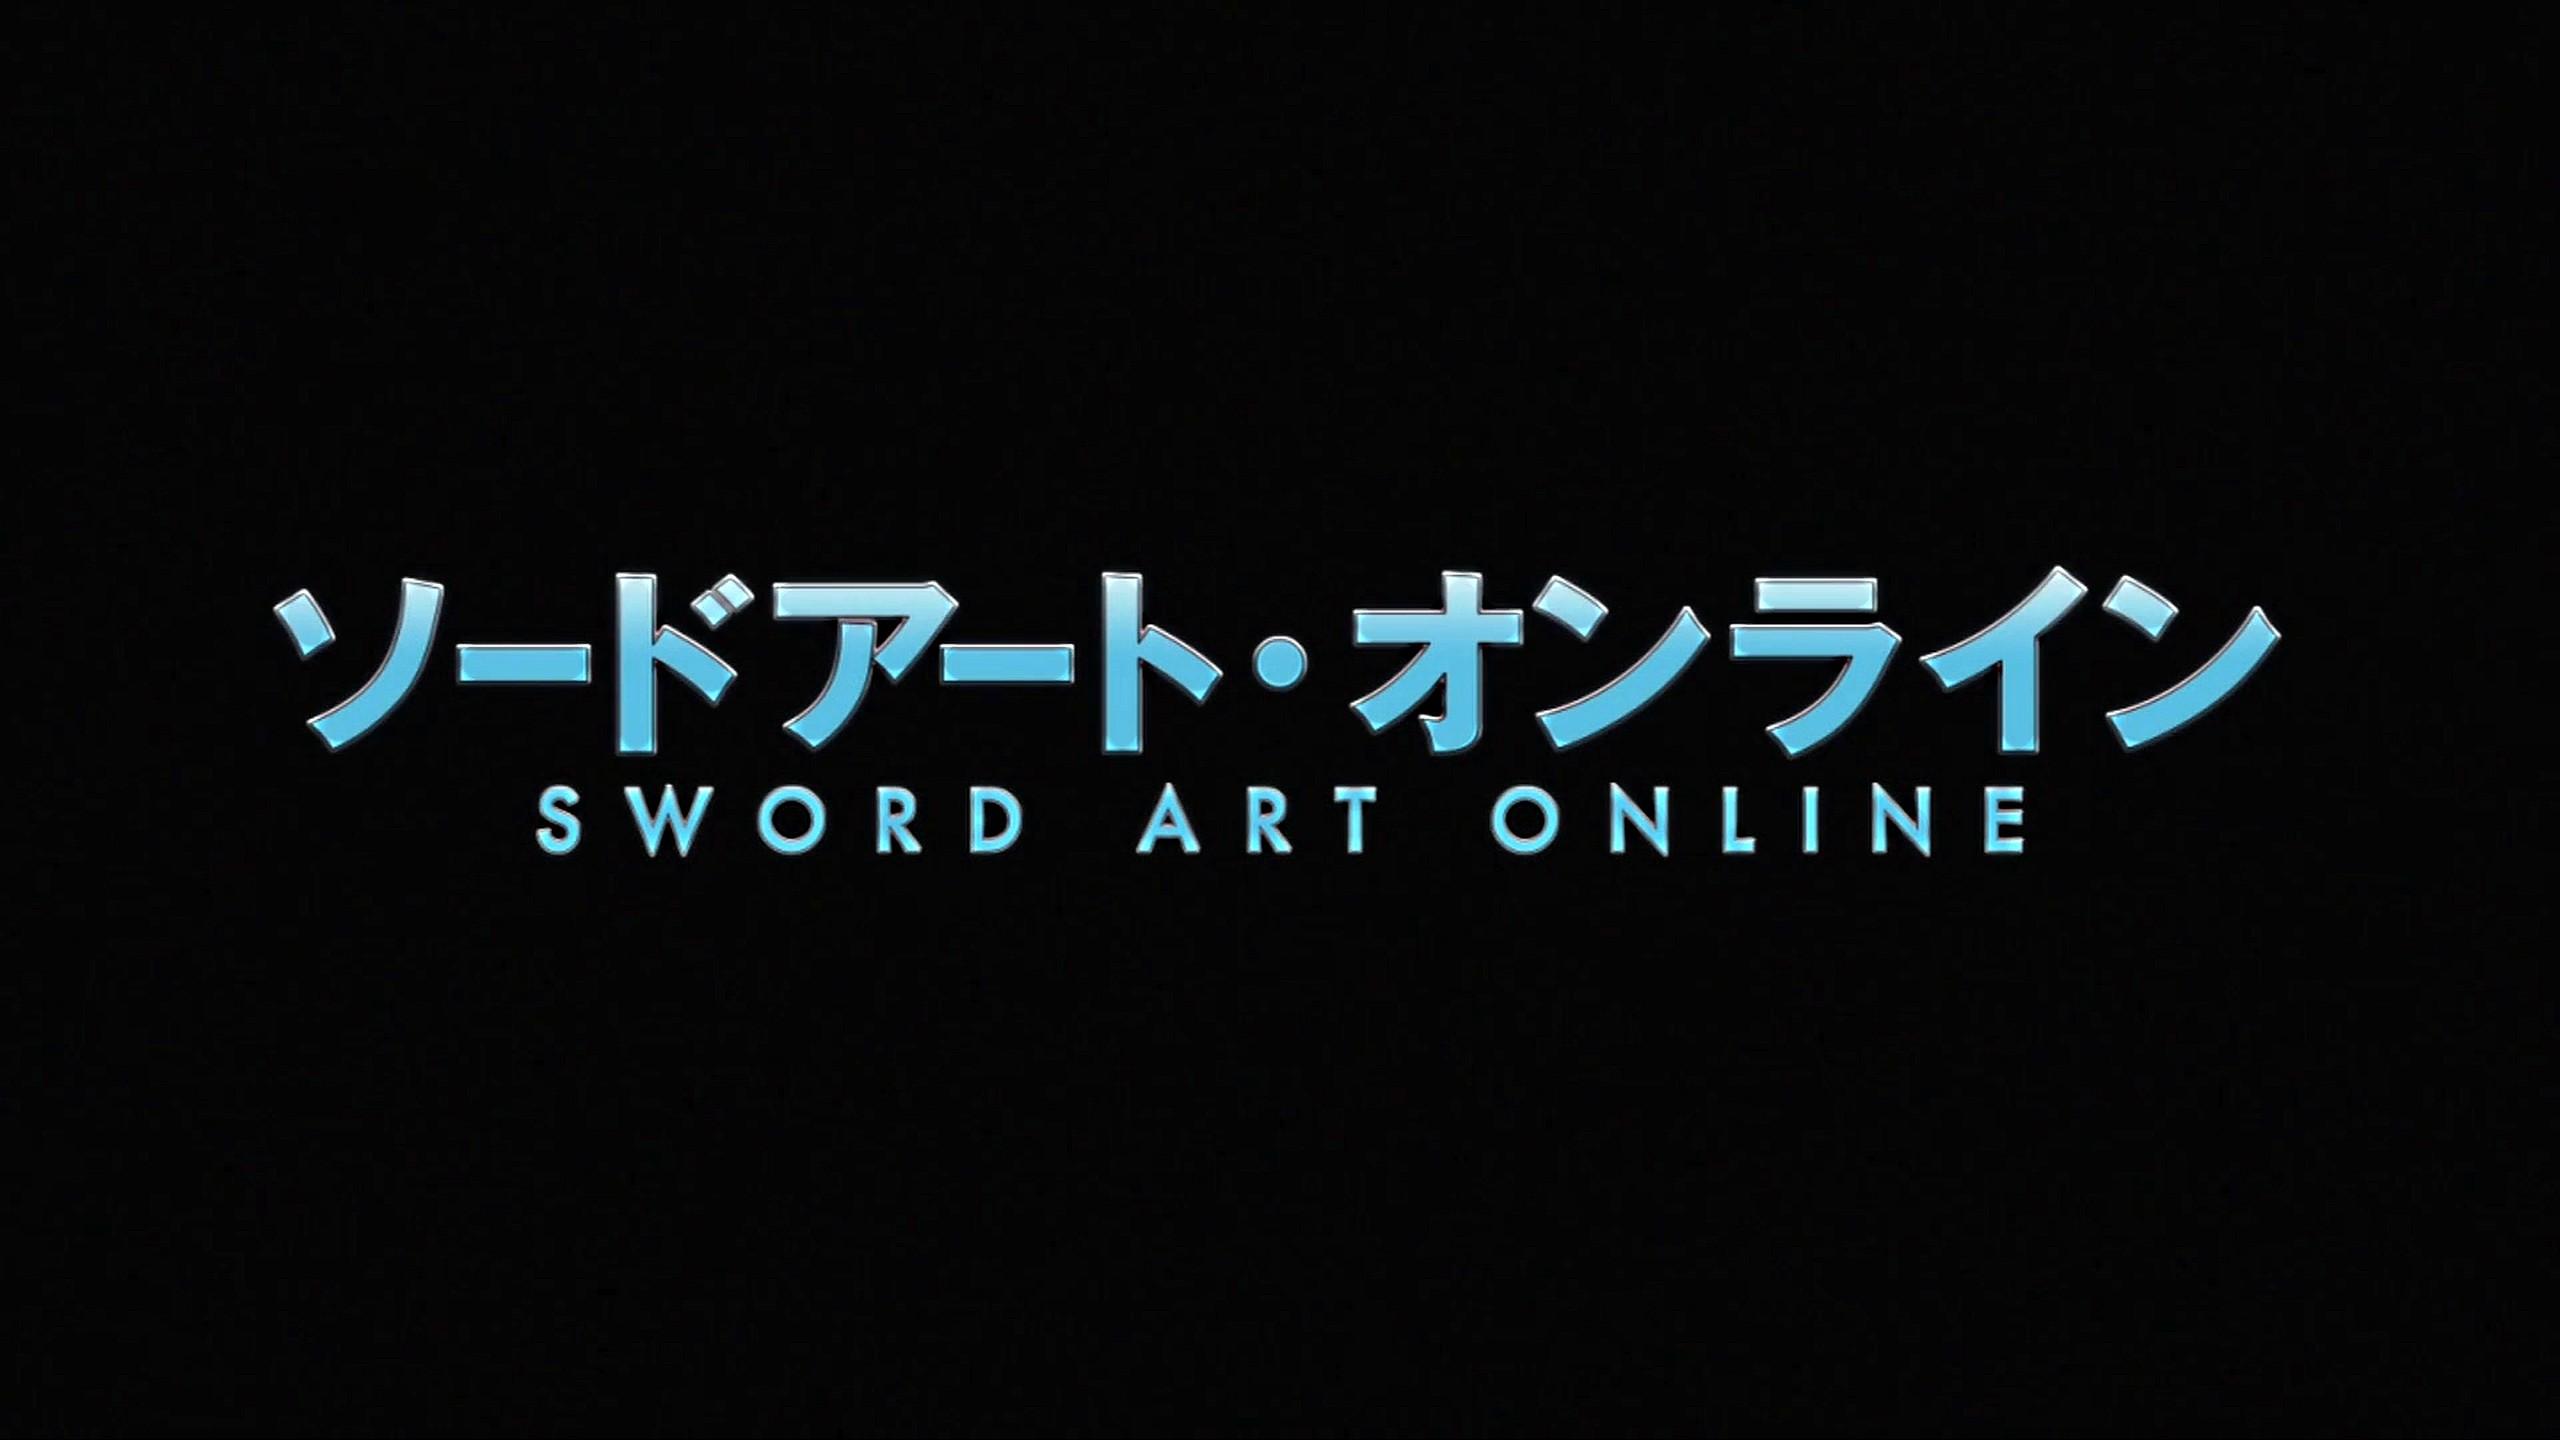 Kirito Sword Art Online · HD Wallpaper | Hintergrund ID:328785